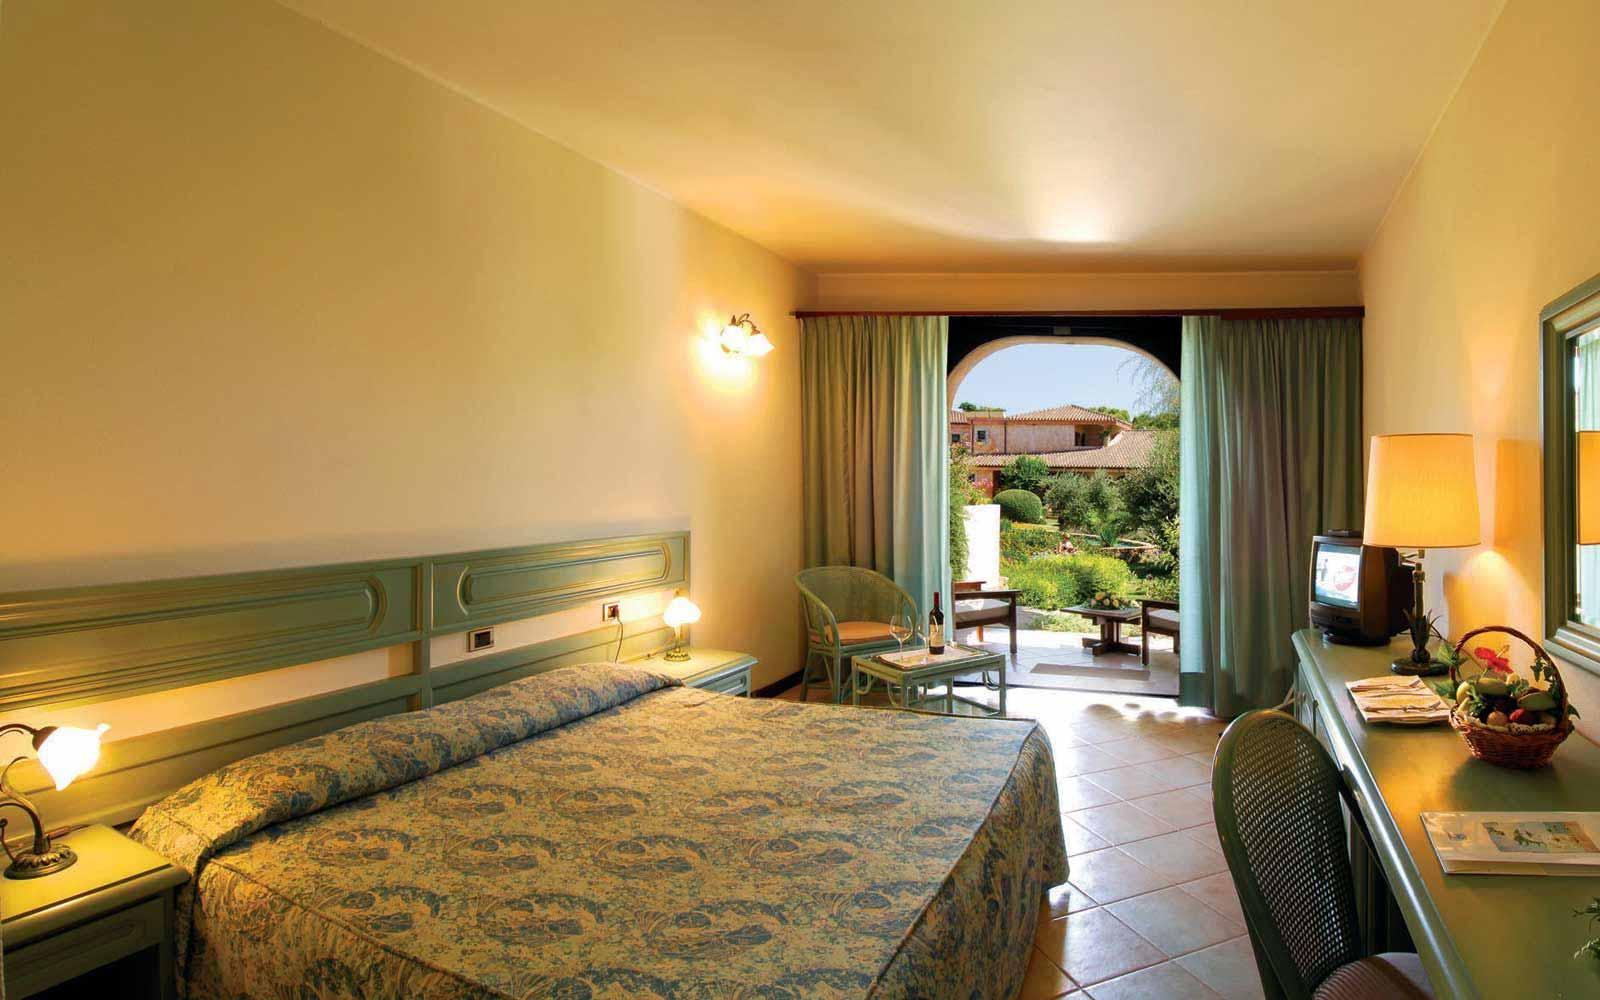 Standard room at Hotel Baia Di Nora